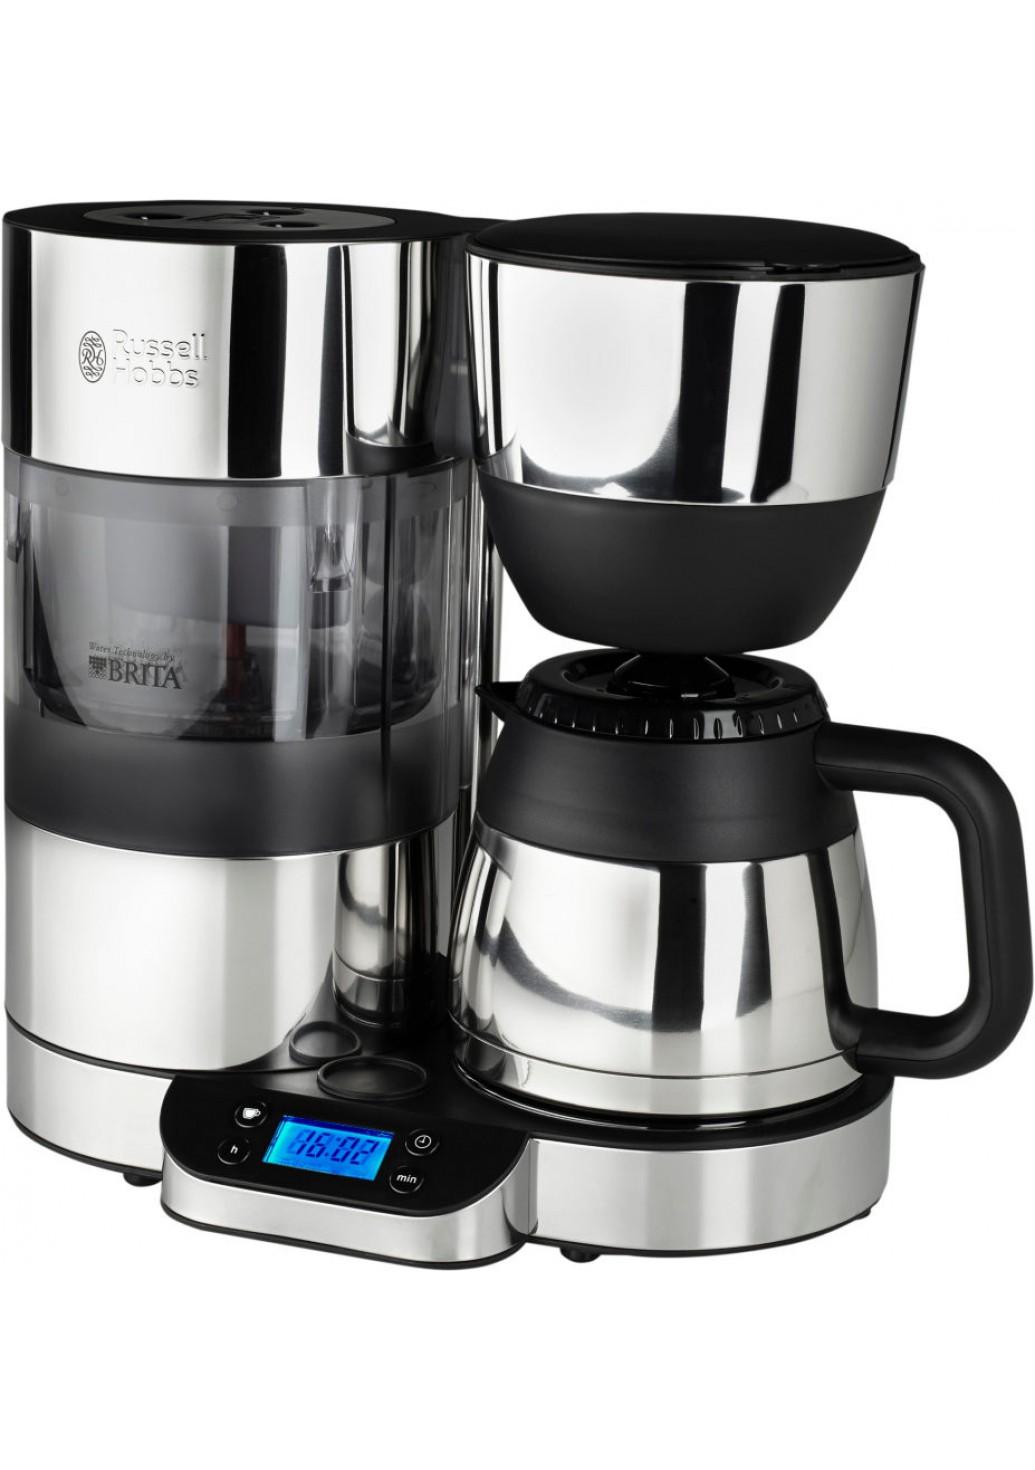 Cafetiera Russell Hobbs 20771-56 Clarity carafa termica filtru apa